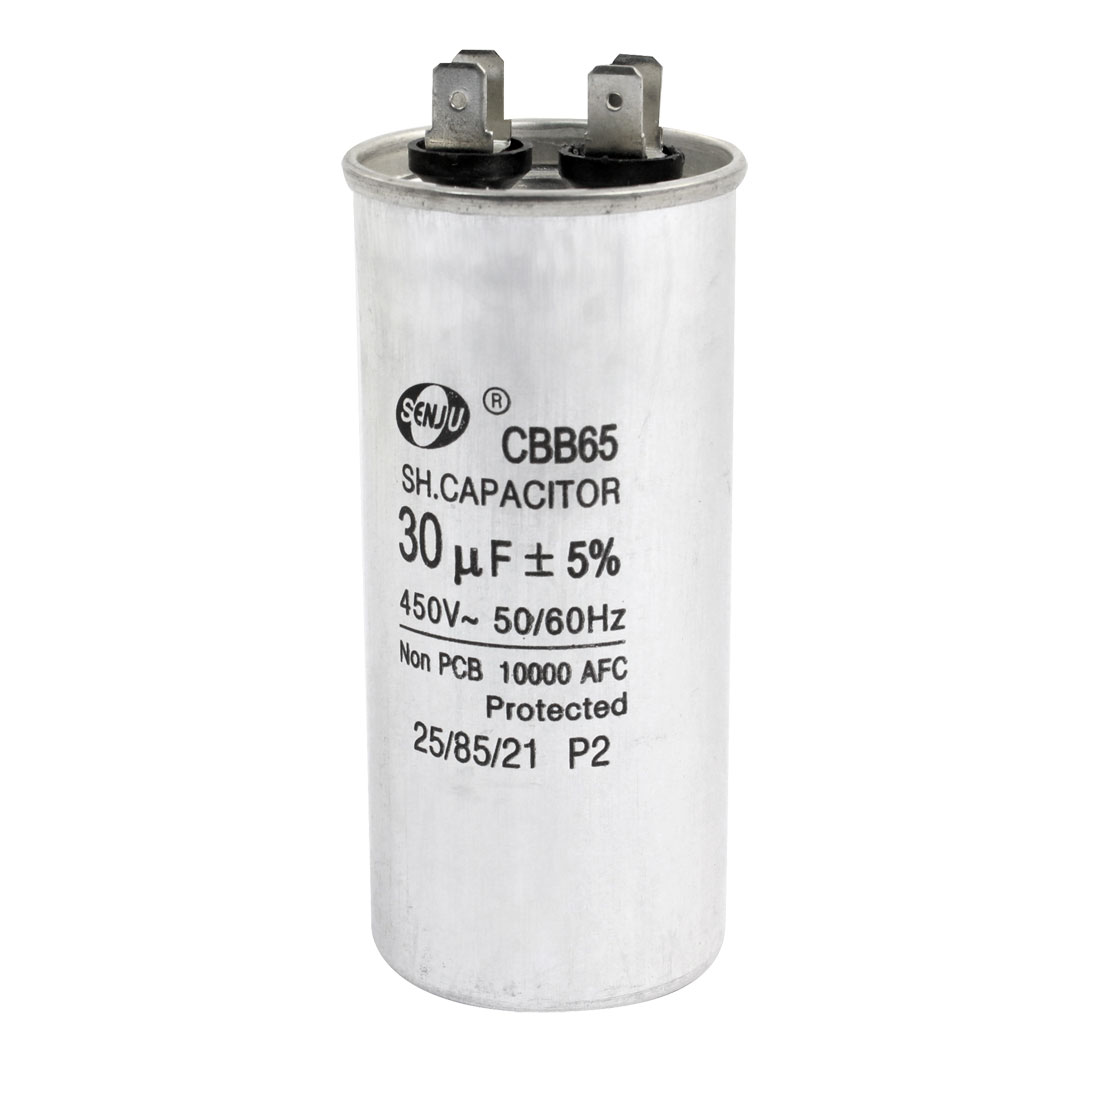 CBB65 AC 450V 30uF 50/60Hz 4 Pin Motor Run Capacitor for Air Conditioner